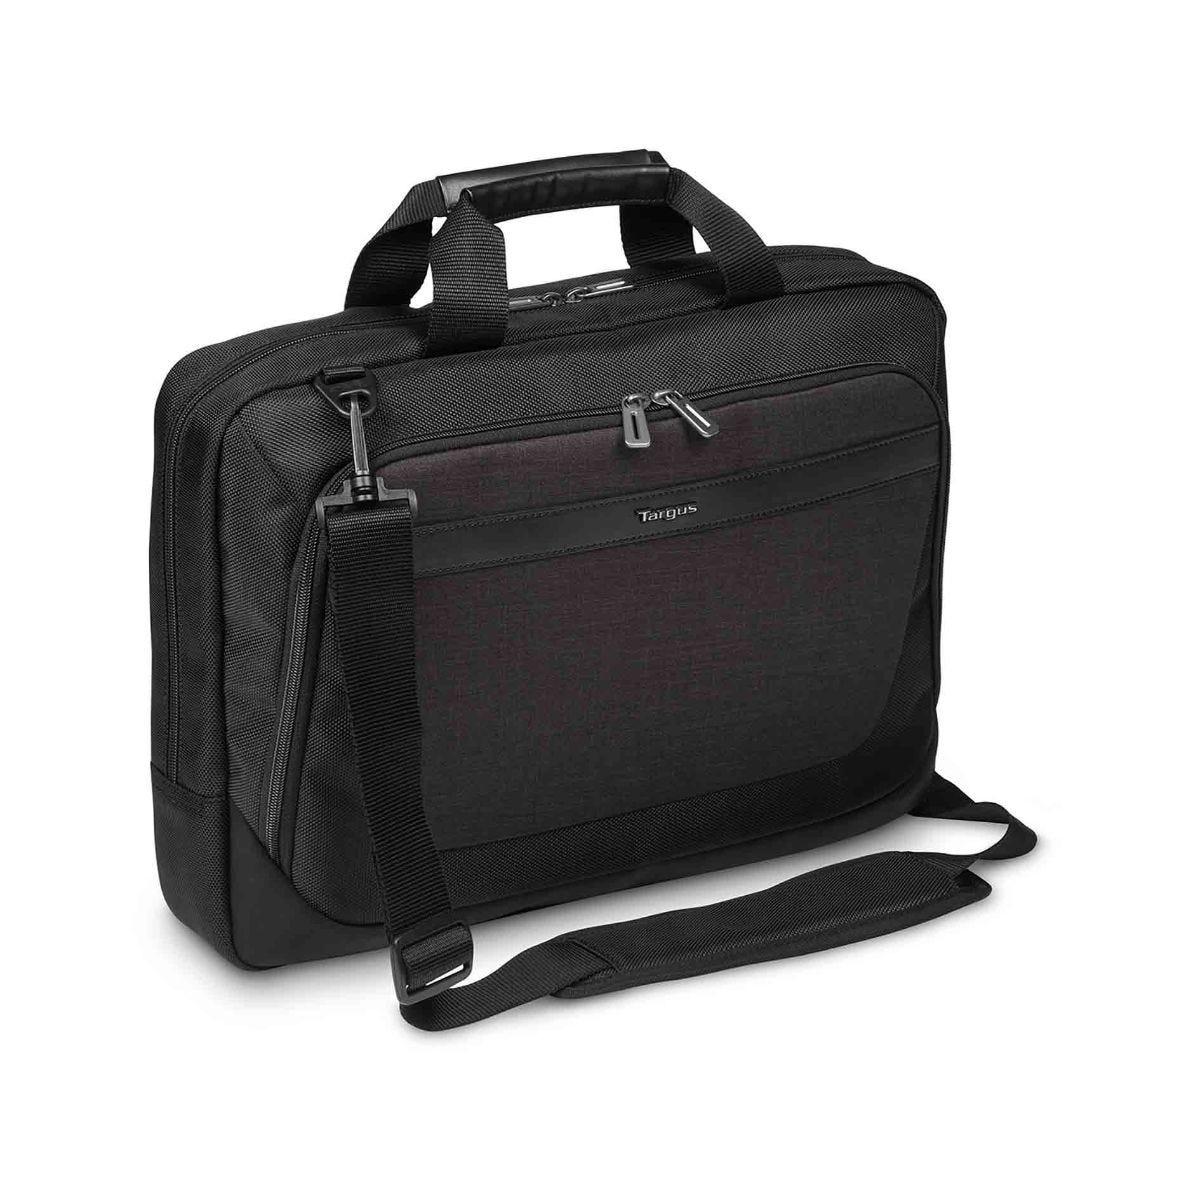 Image of Targus CitySmart Slimline Topload Laptop Case 15.6 Inch, Black/Grey